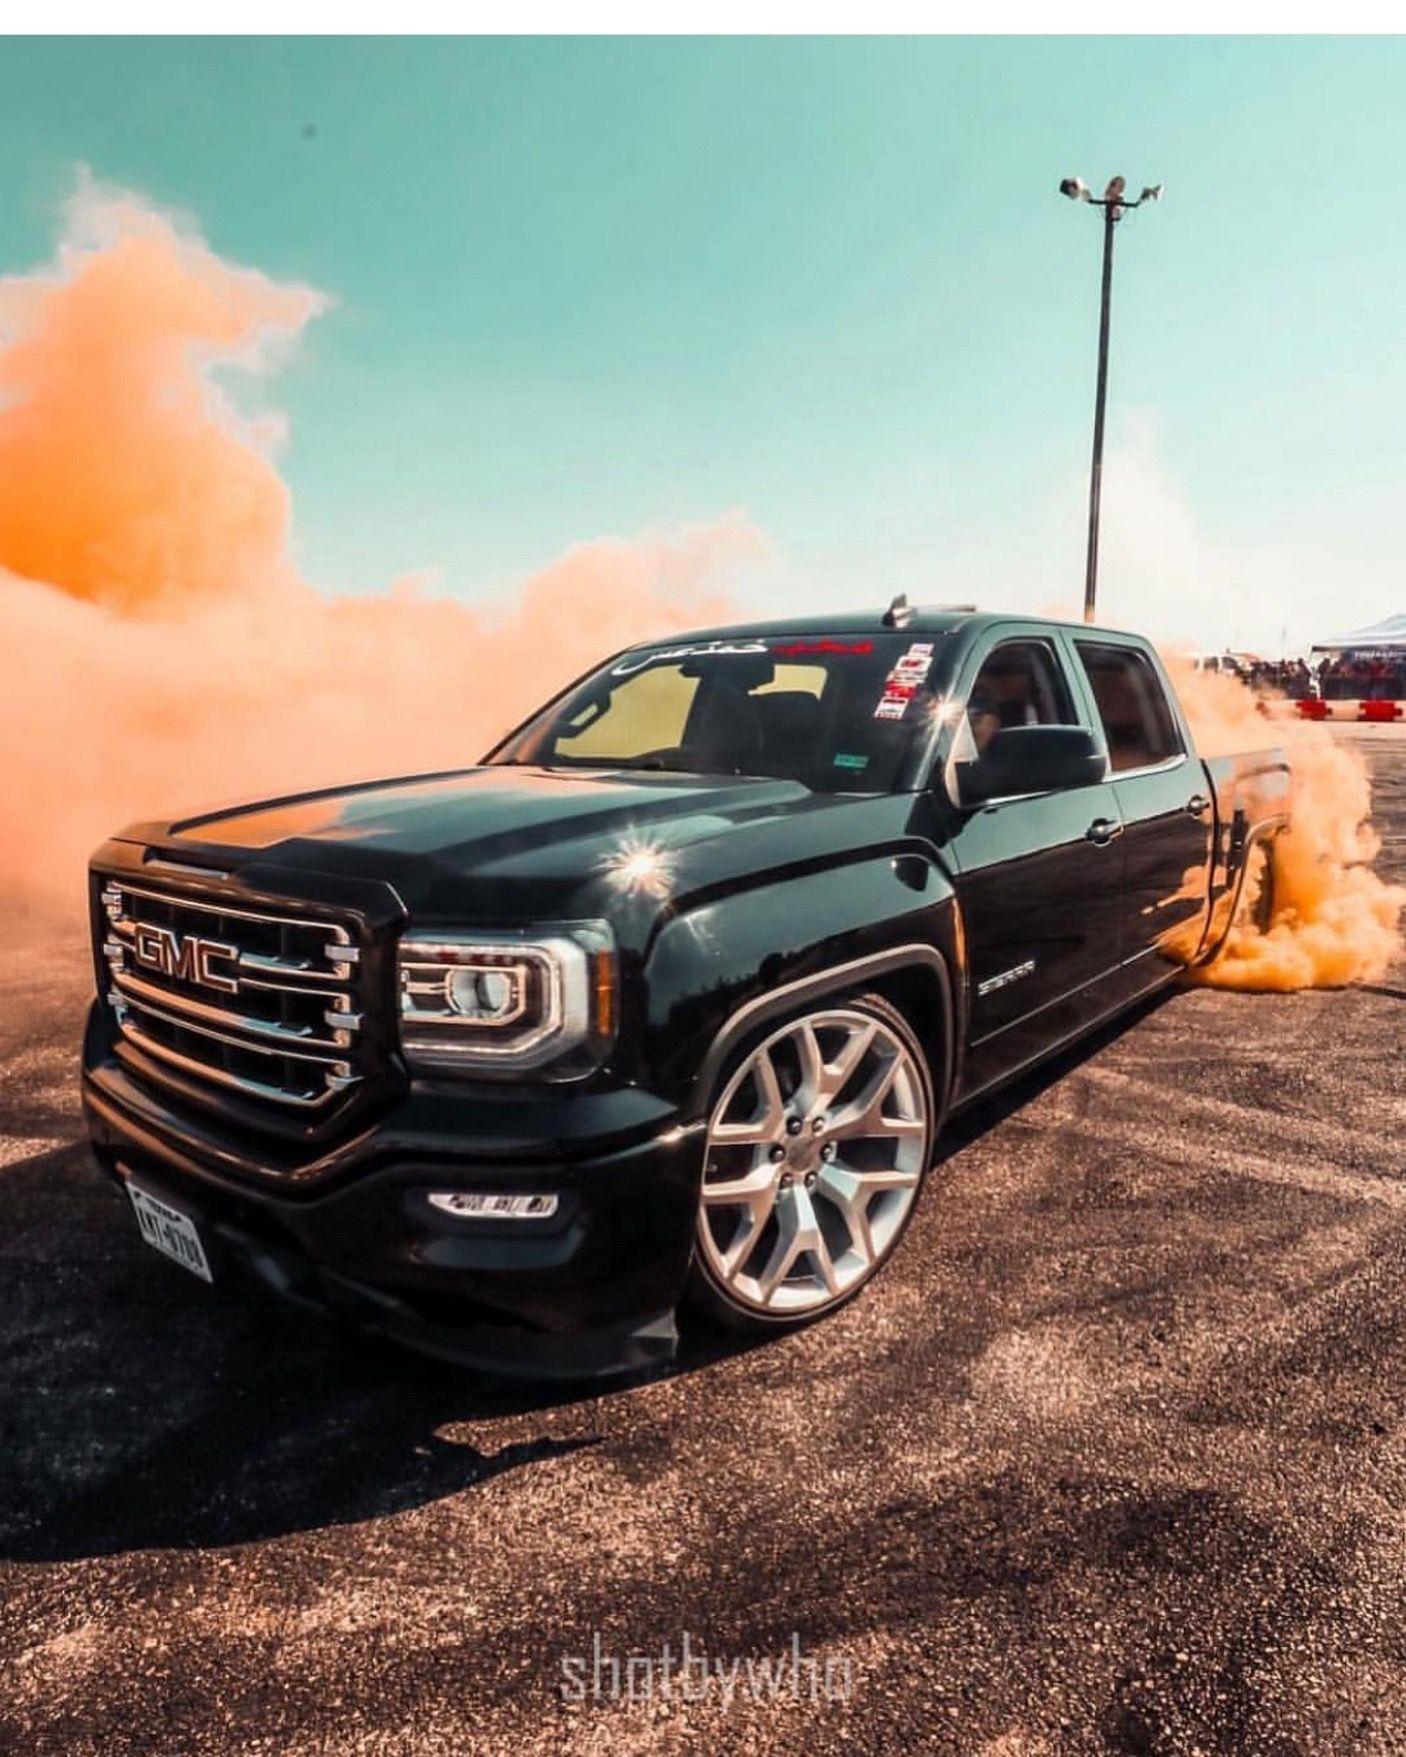 Gmc Trucks, Dream Cars, Sweet Ride